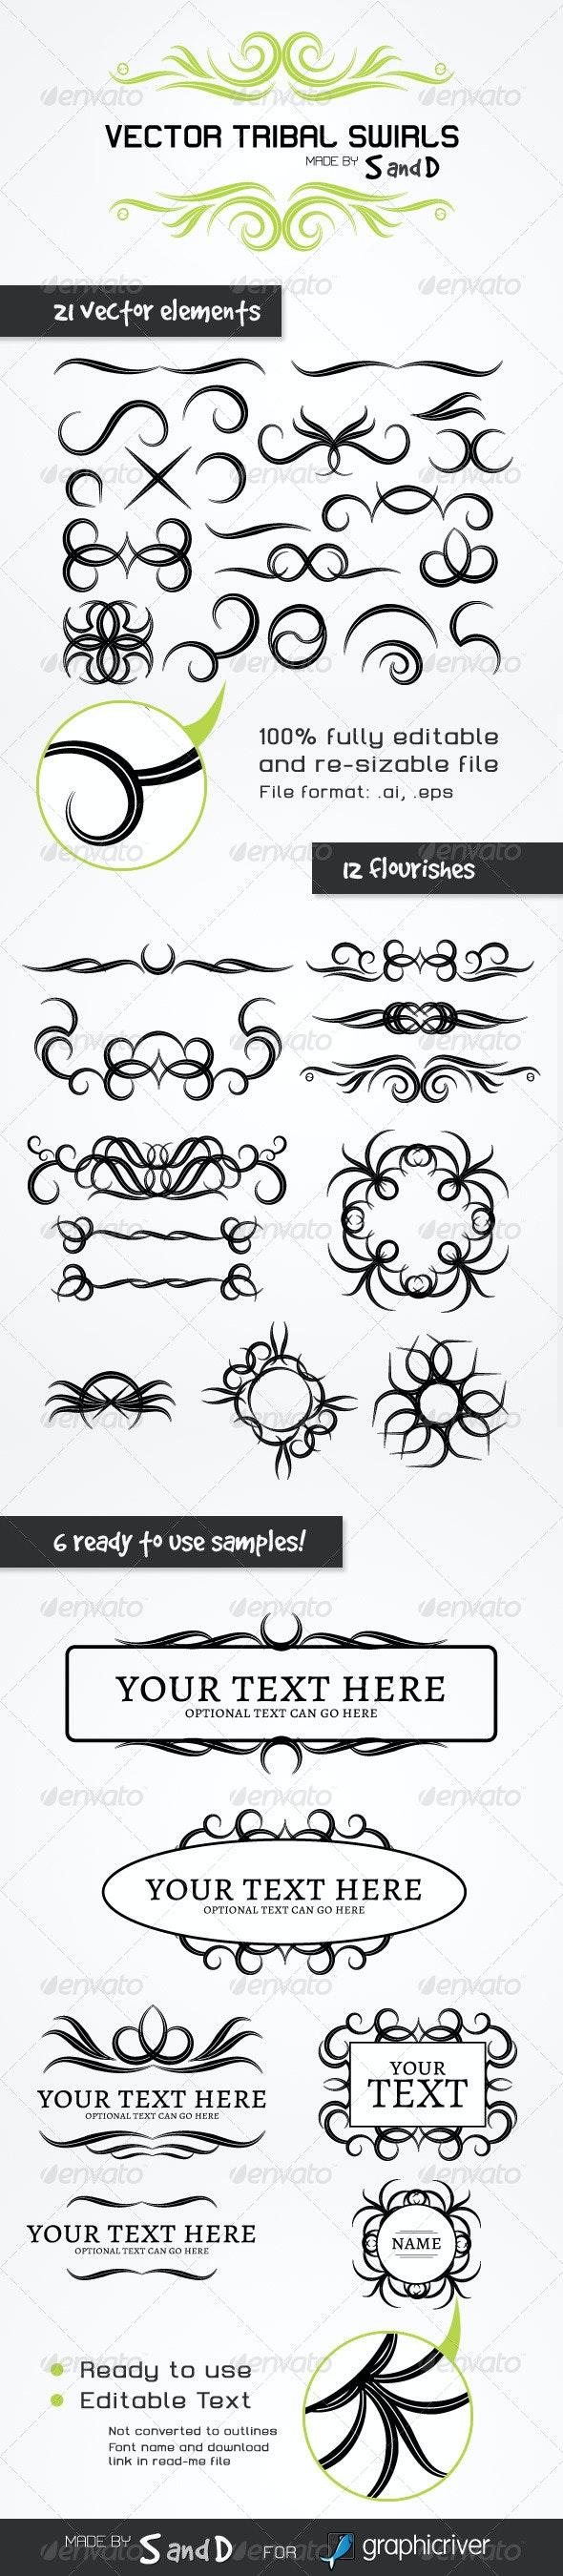 39 Vector Tribal Items - Flourishes / Swirls Decorative